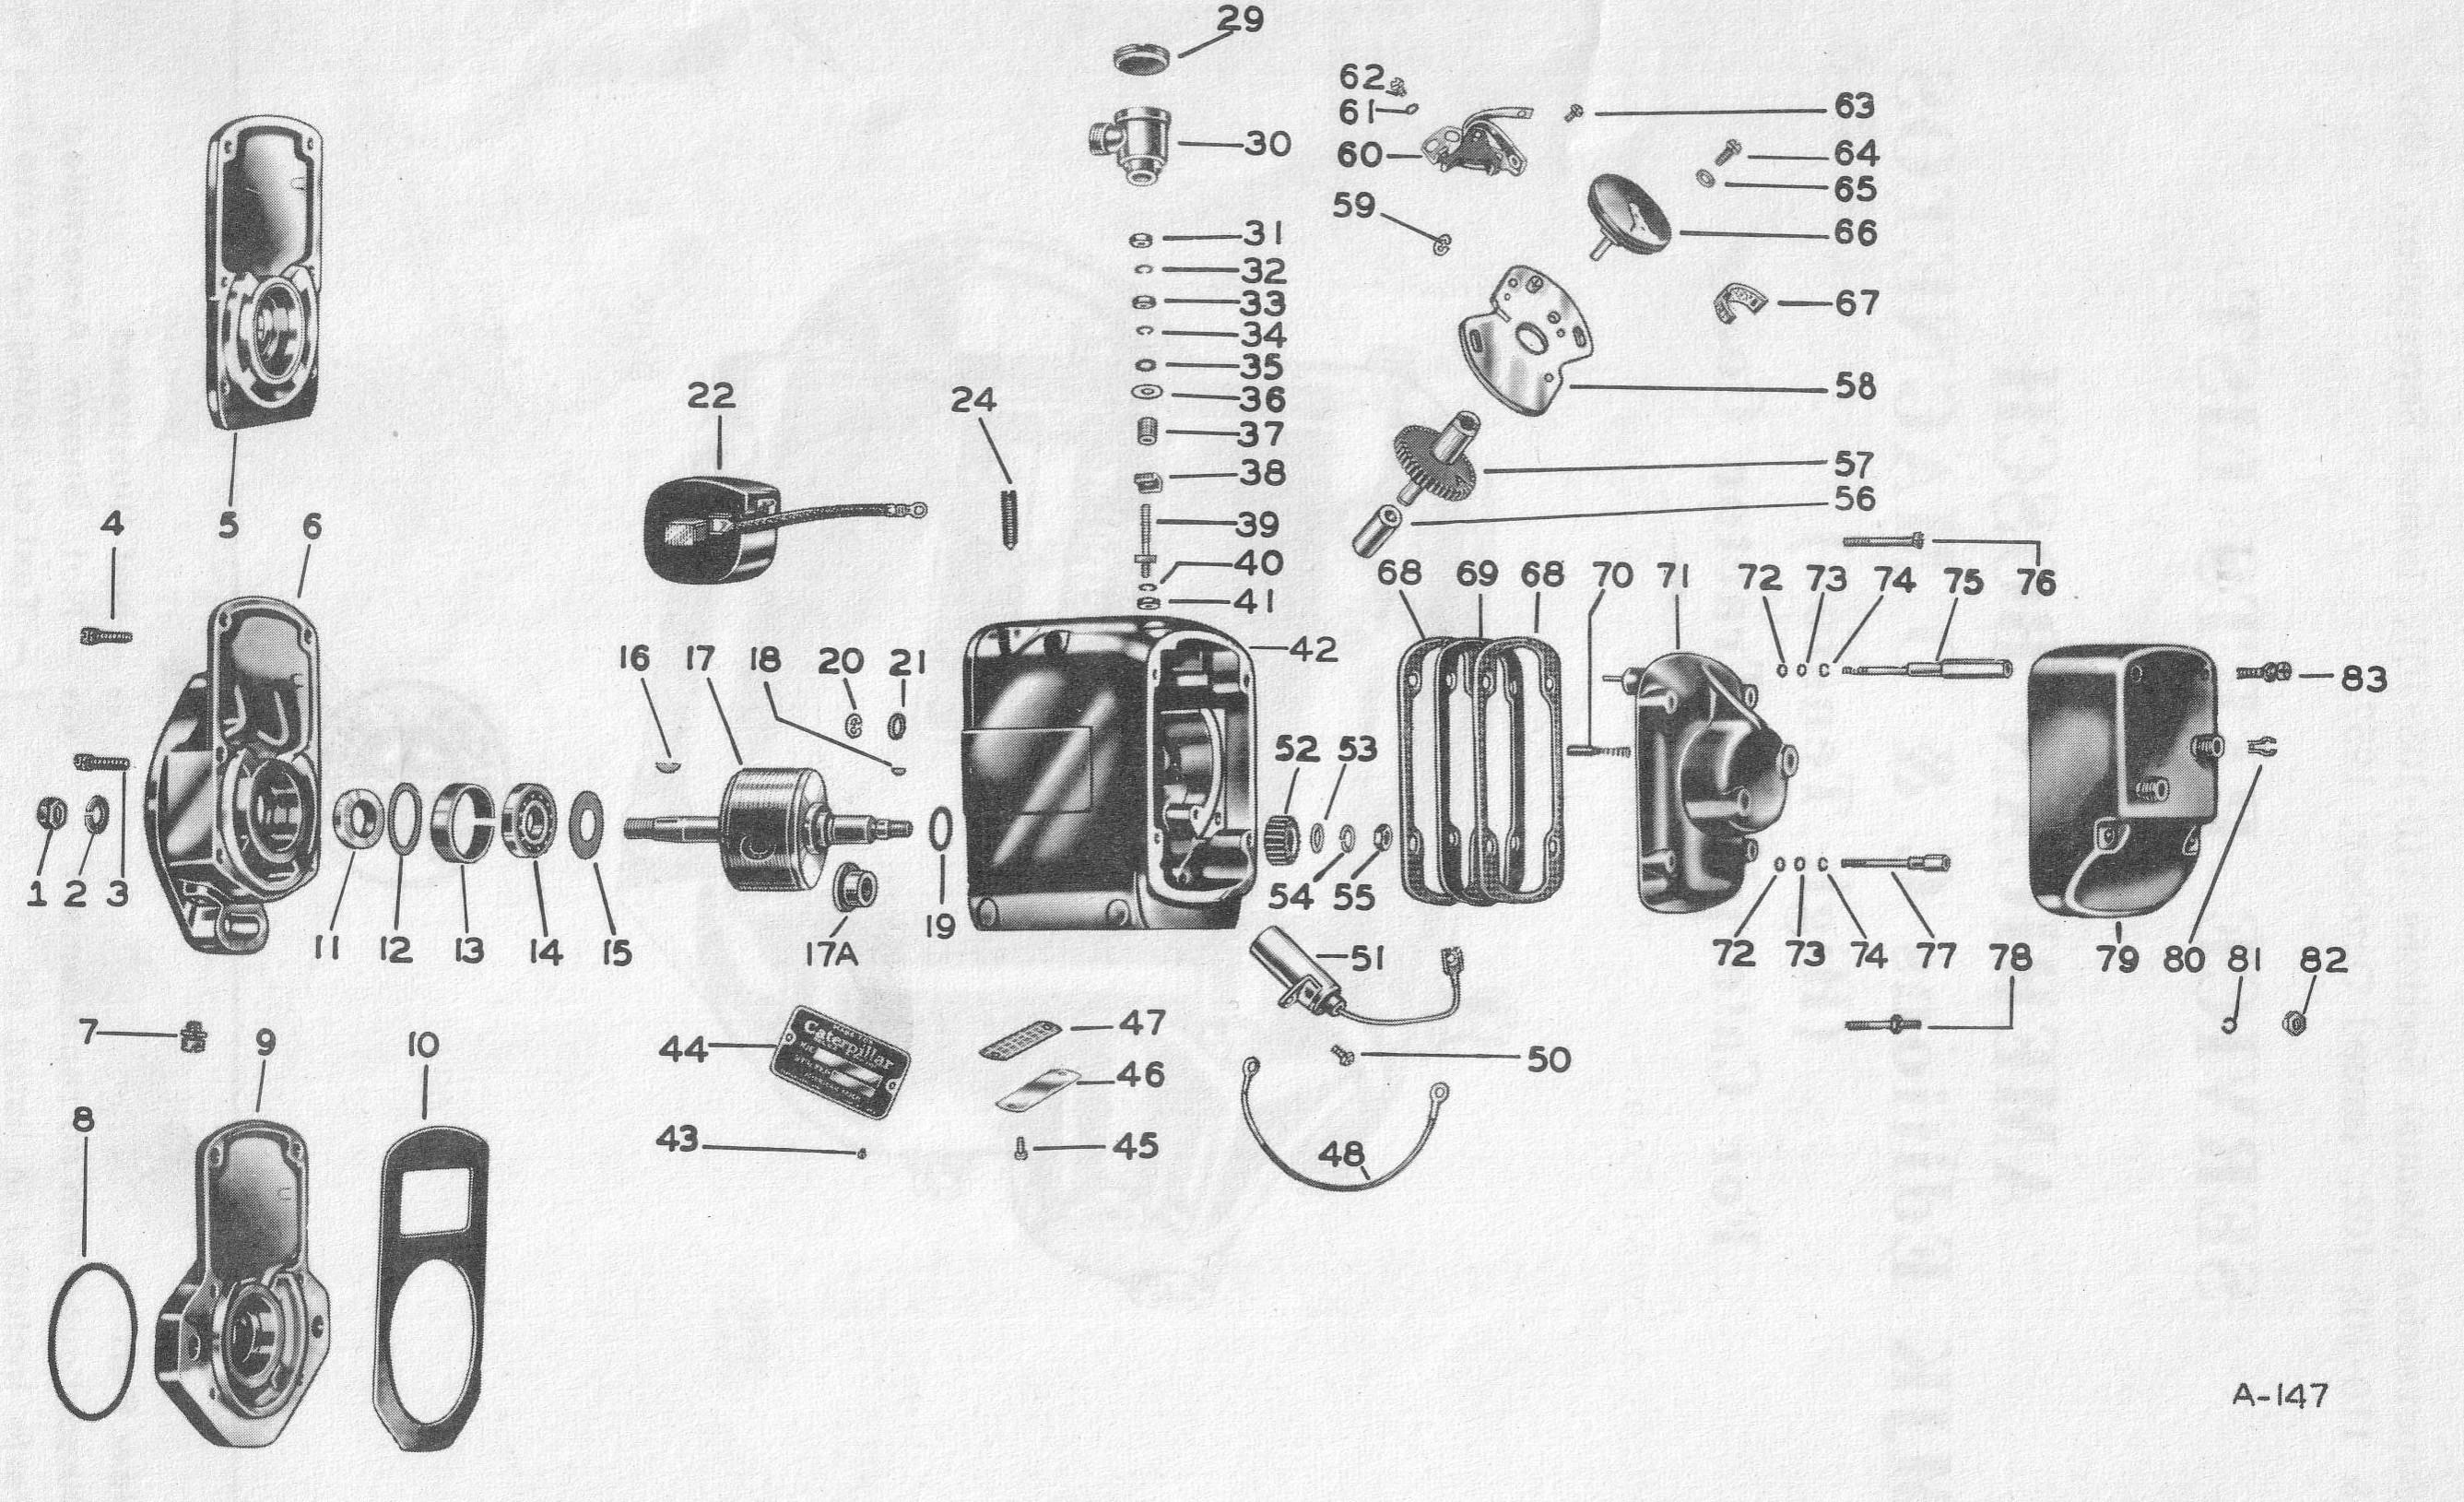 Bendix Magneto Wiring Diagram Bmw Z3 Stereo Wiring